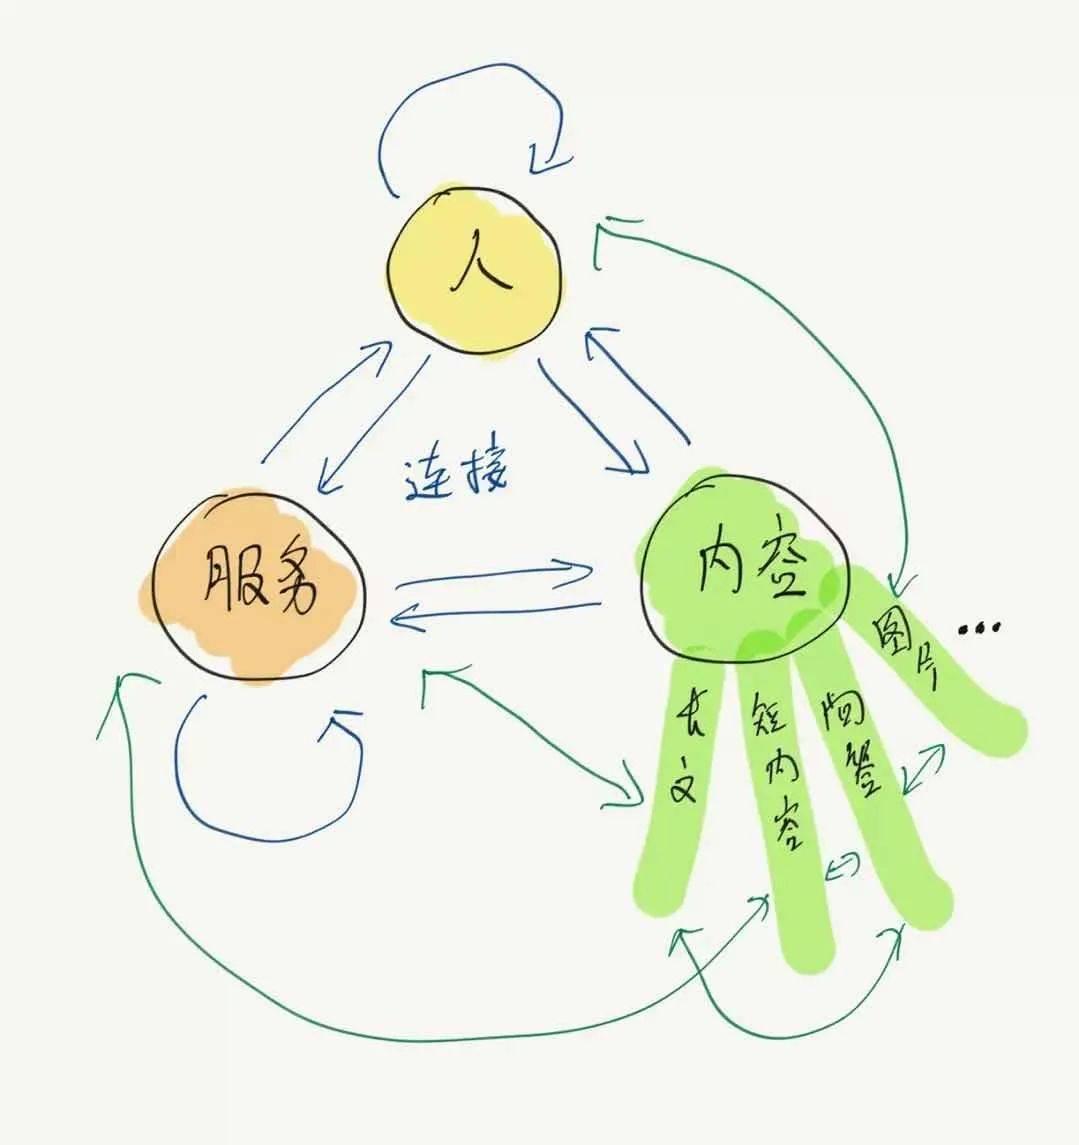 <a href='http://mcnjigou.com/?tags=3'>抖音</a>、<a href='http://mcnjigou.com/?tags=4'>快手</a>短视频是个机会,但会是我的机会吗?你肯定也反问自己!